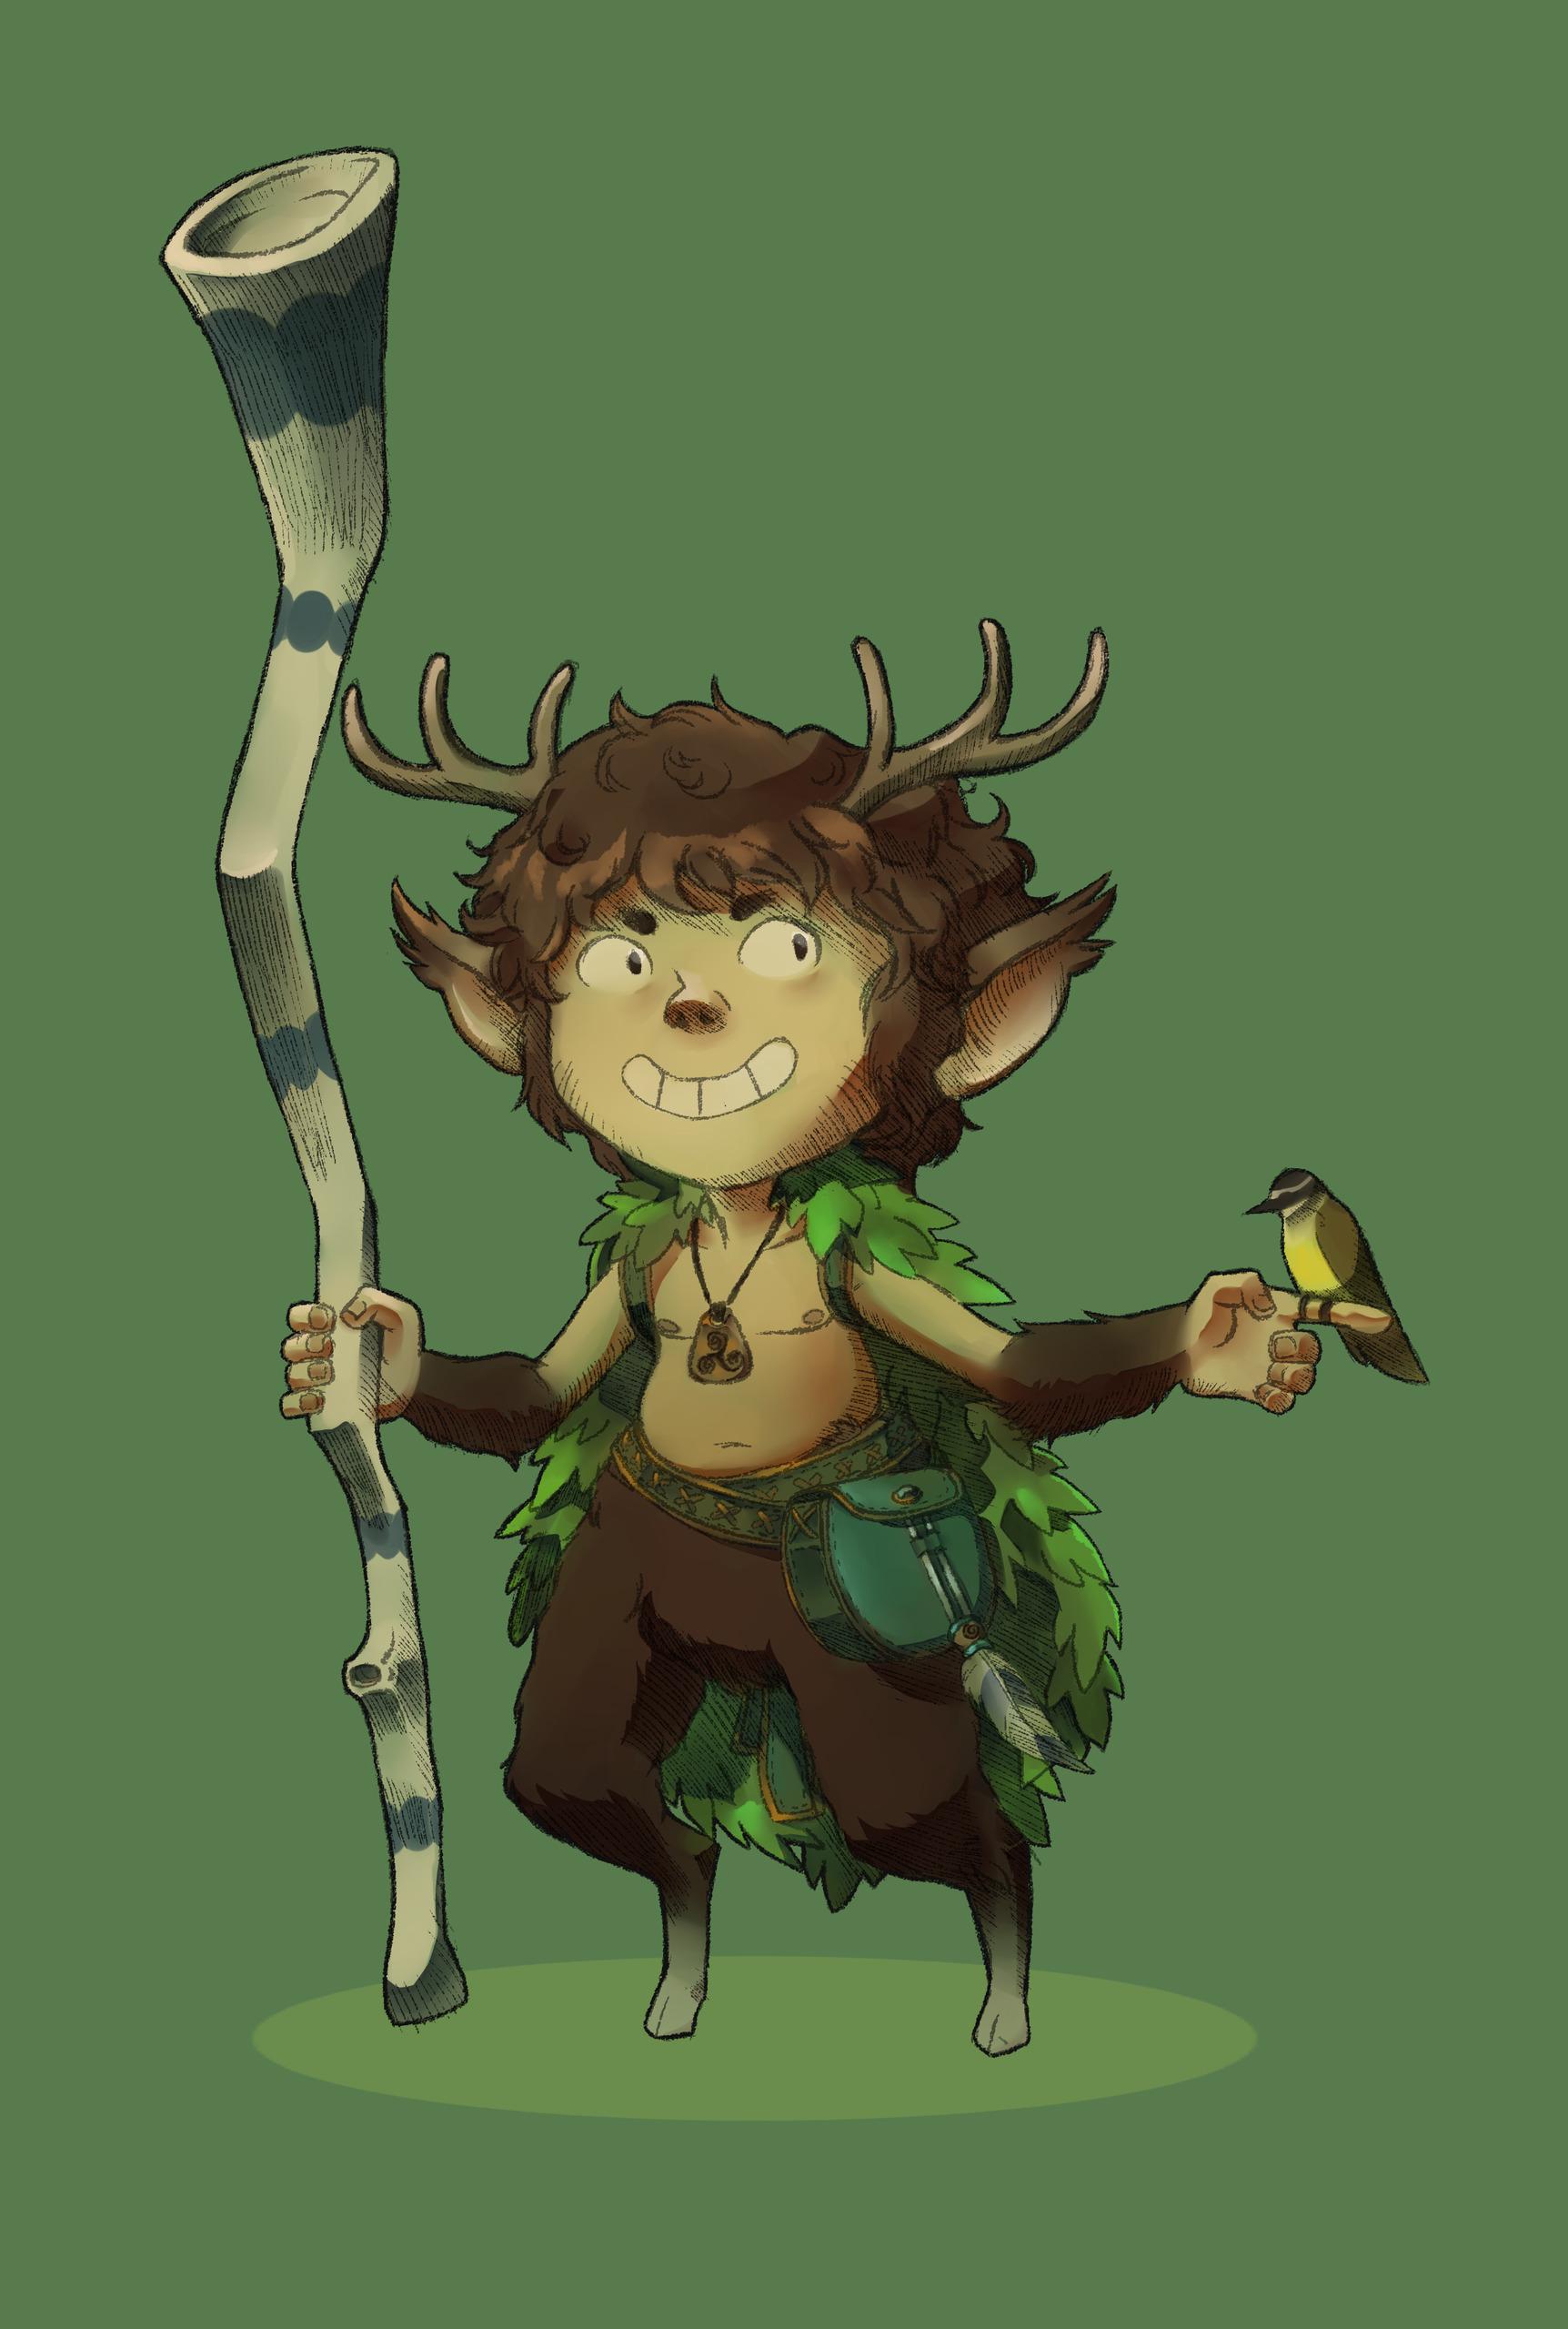 Druid Faun - faun, druid, fauno - brunodesn | ello